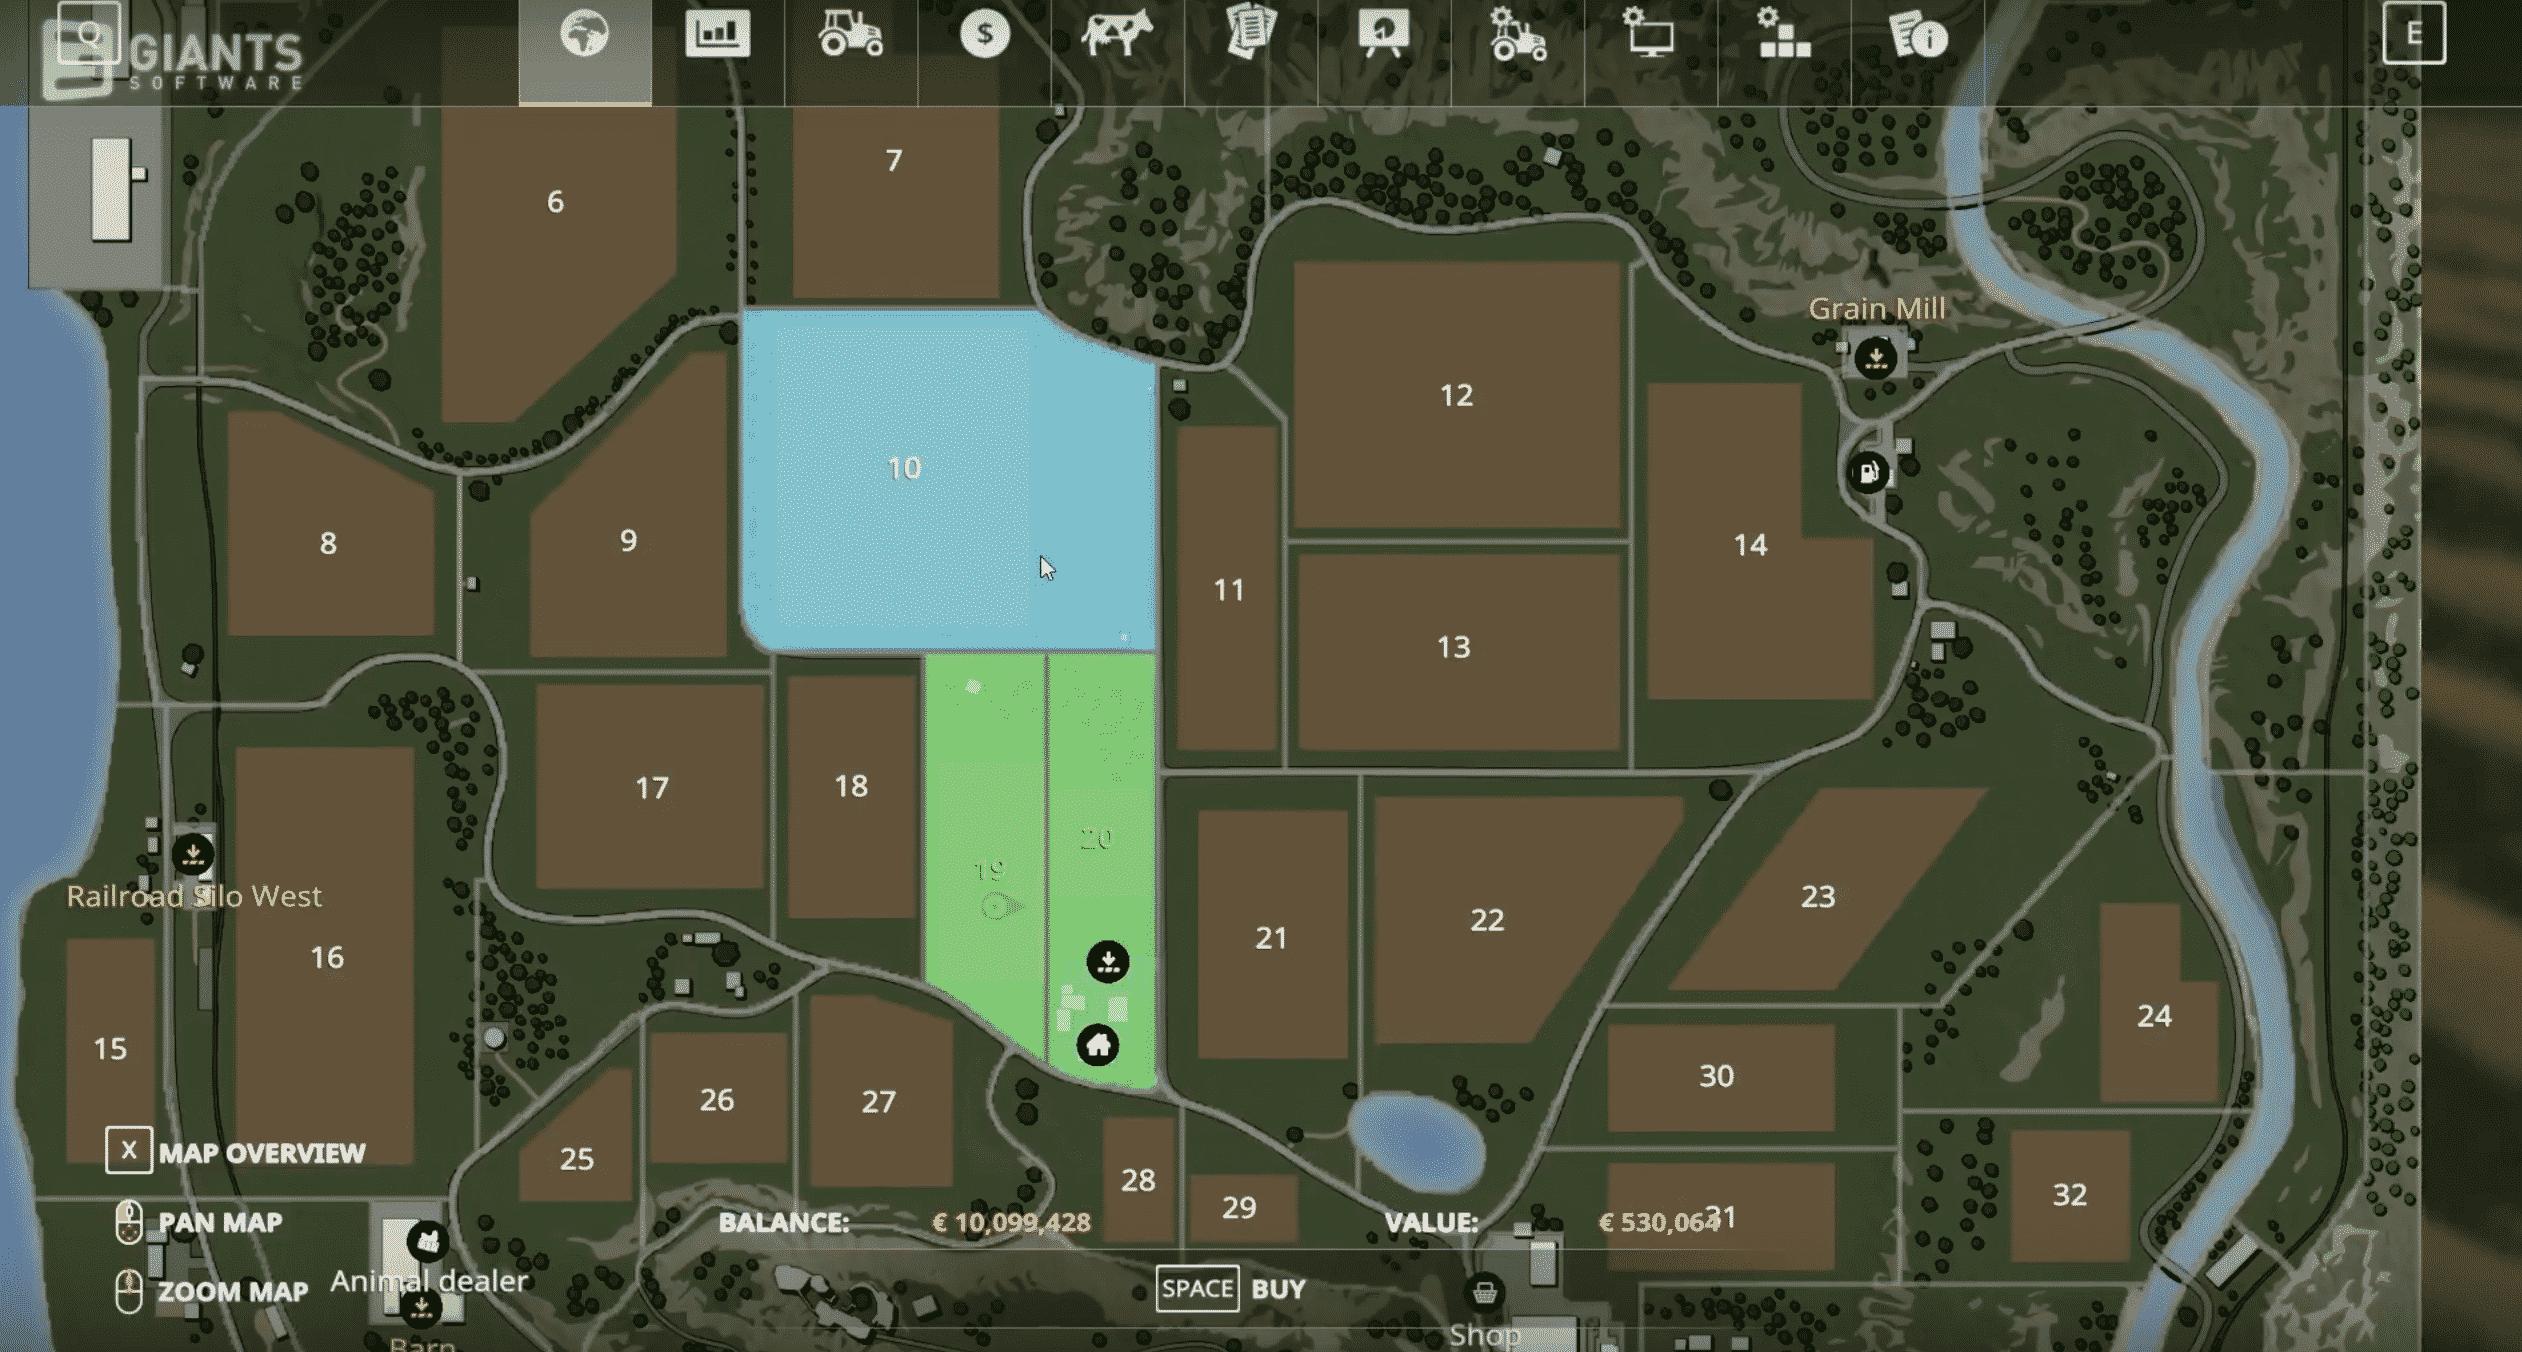 Farming Simulator 19: Buildings, Combines, Vehicles, Maps FS